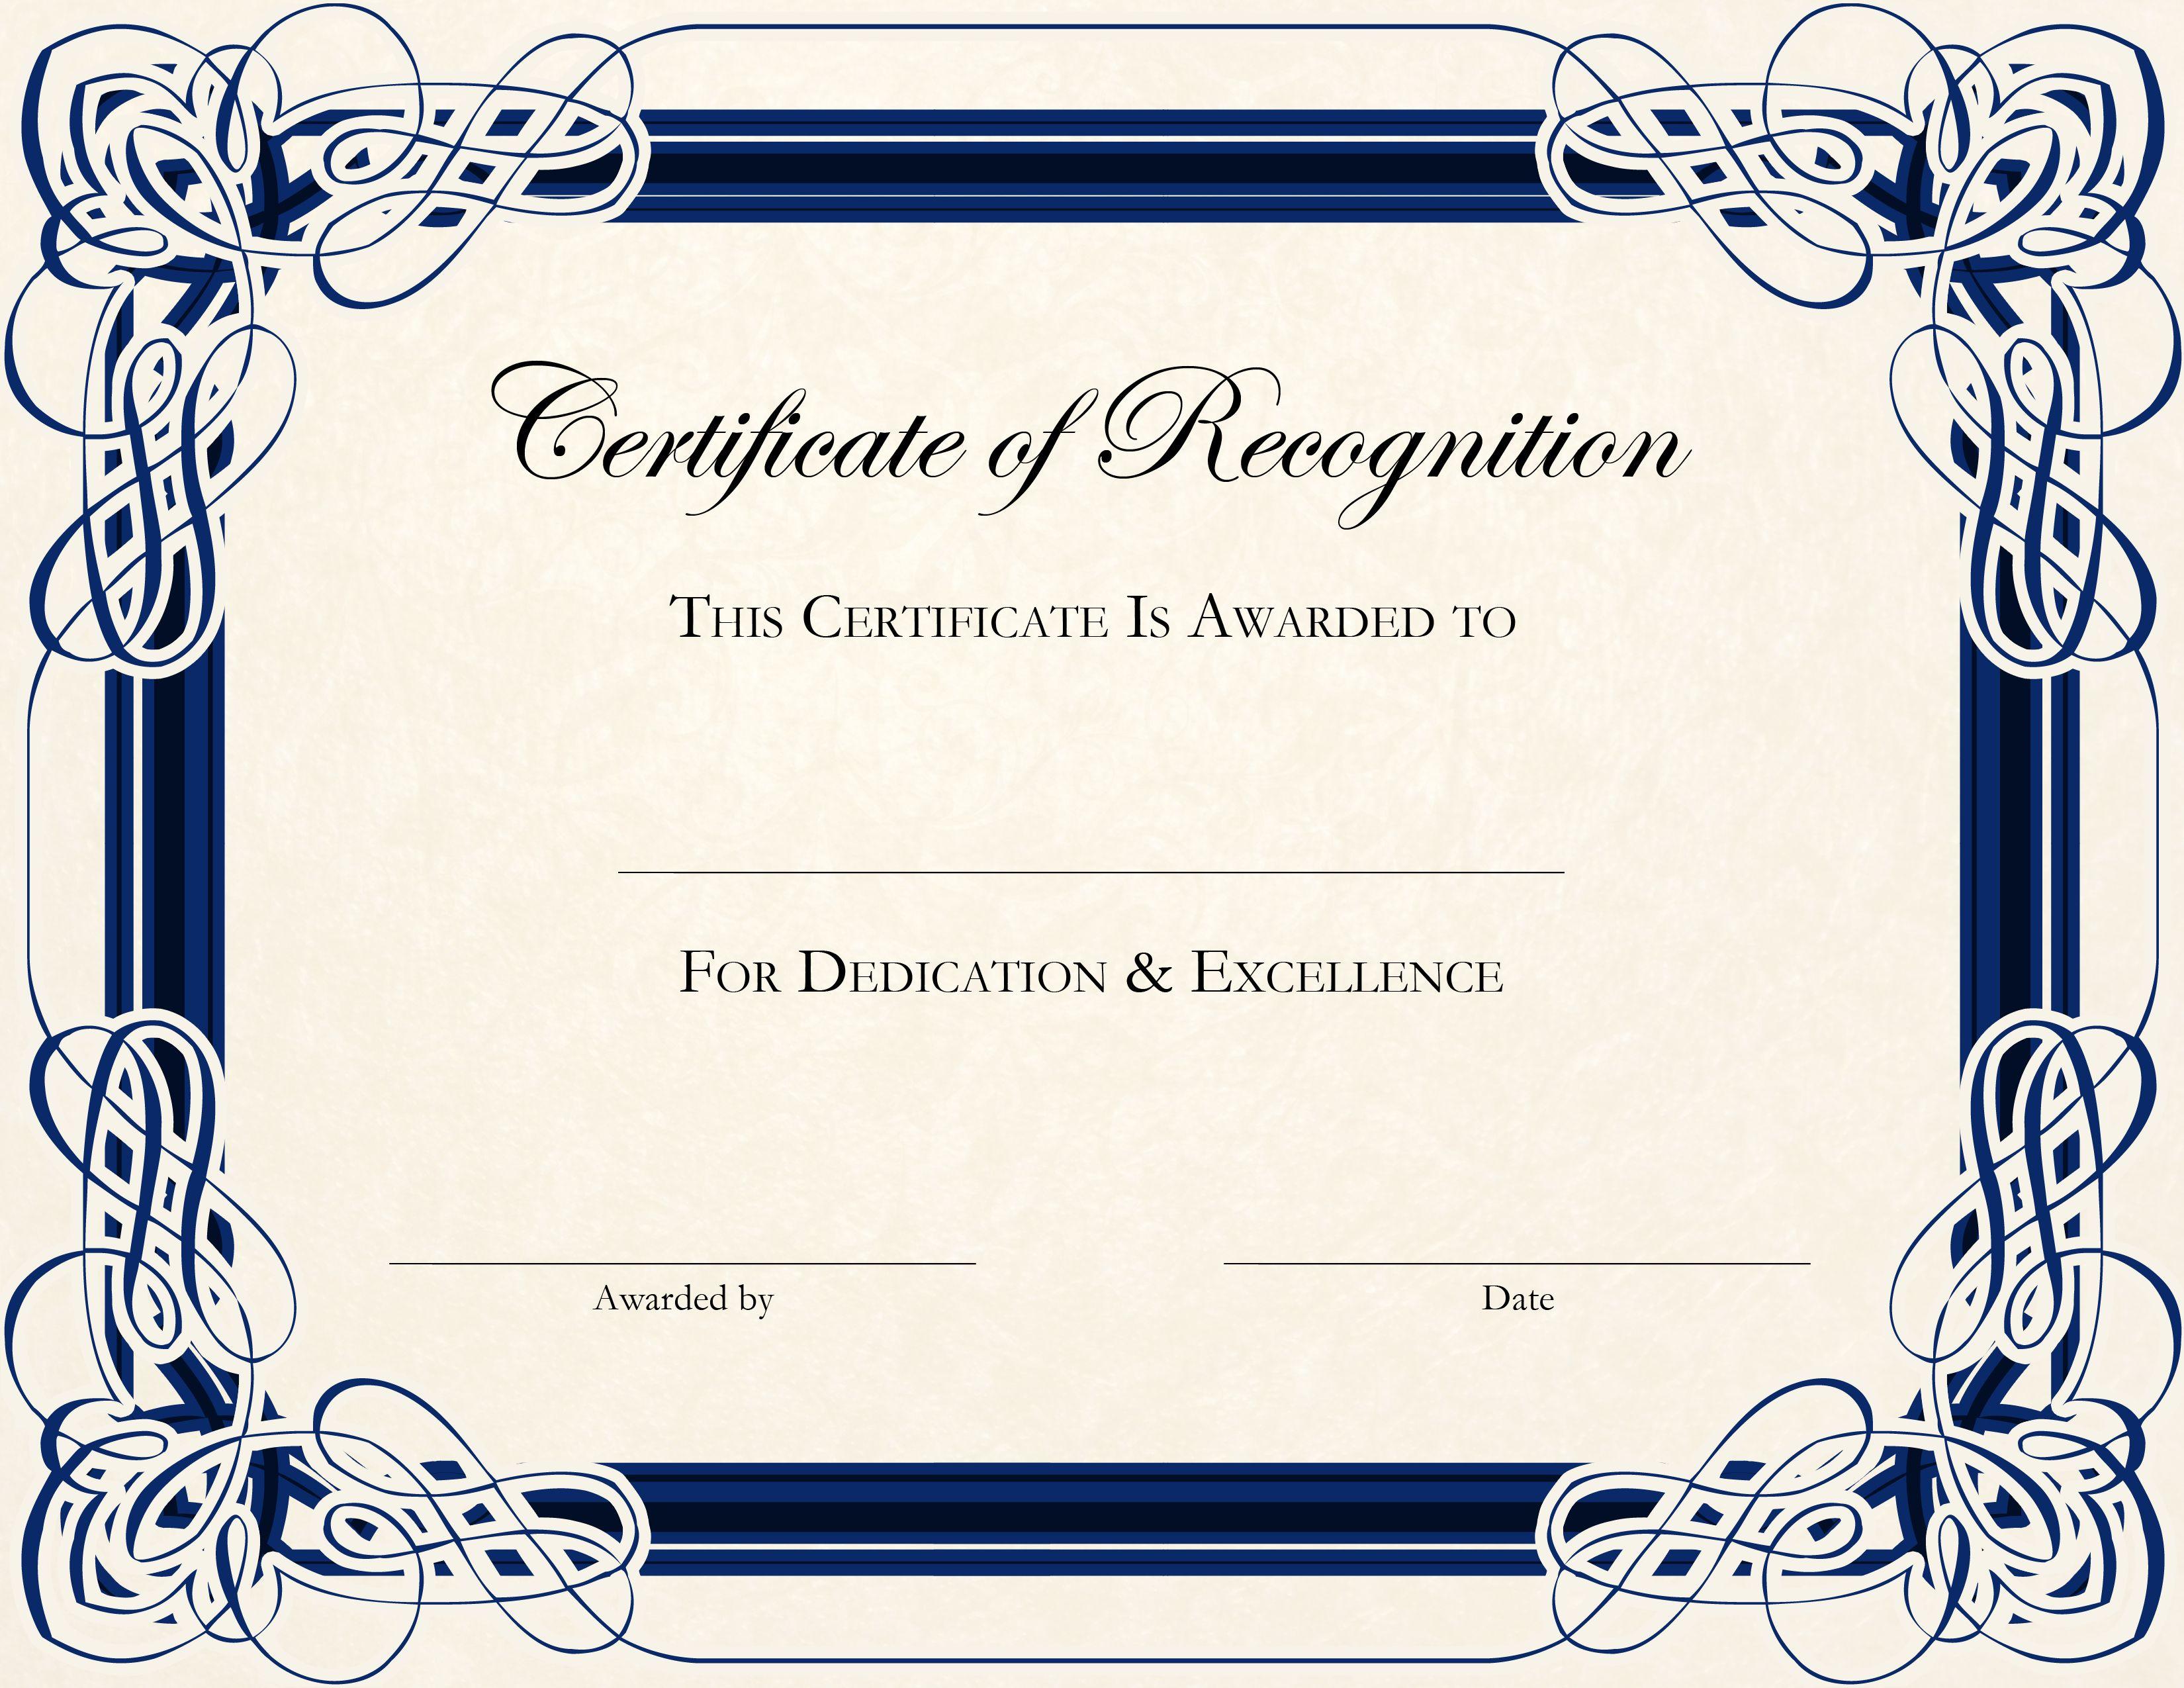 Certificate Template Designs Recognition Docs Certificate Of Recognition Template Graduation Certificate Template Free Certificate Templates